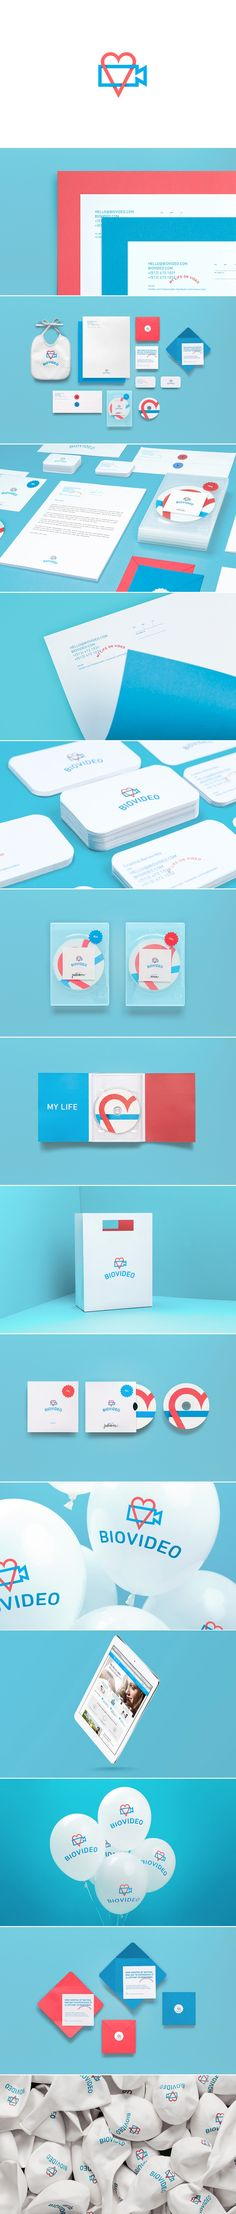 BioVideo — The Dieline - Branding & Packaging Design - created via https://pinthemall.net